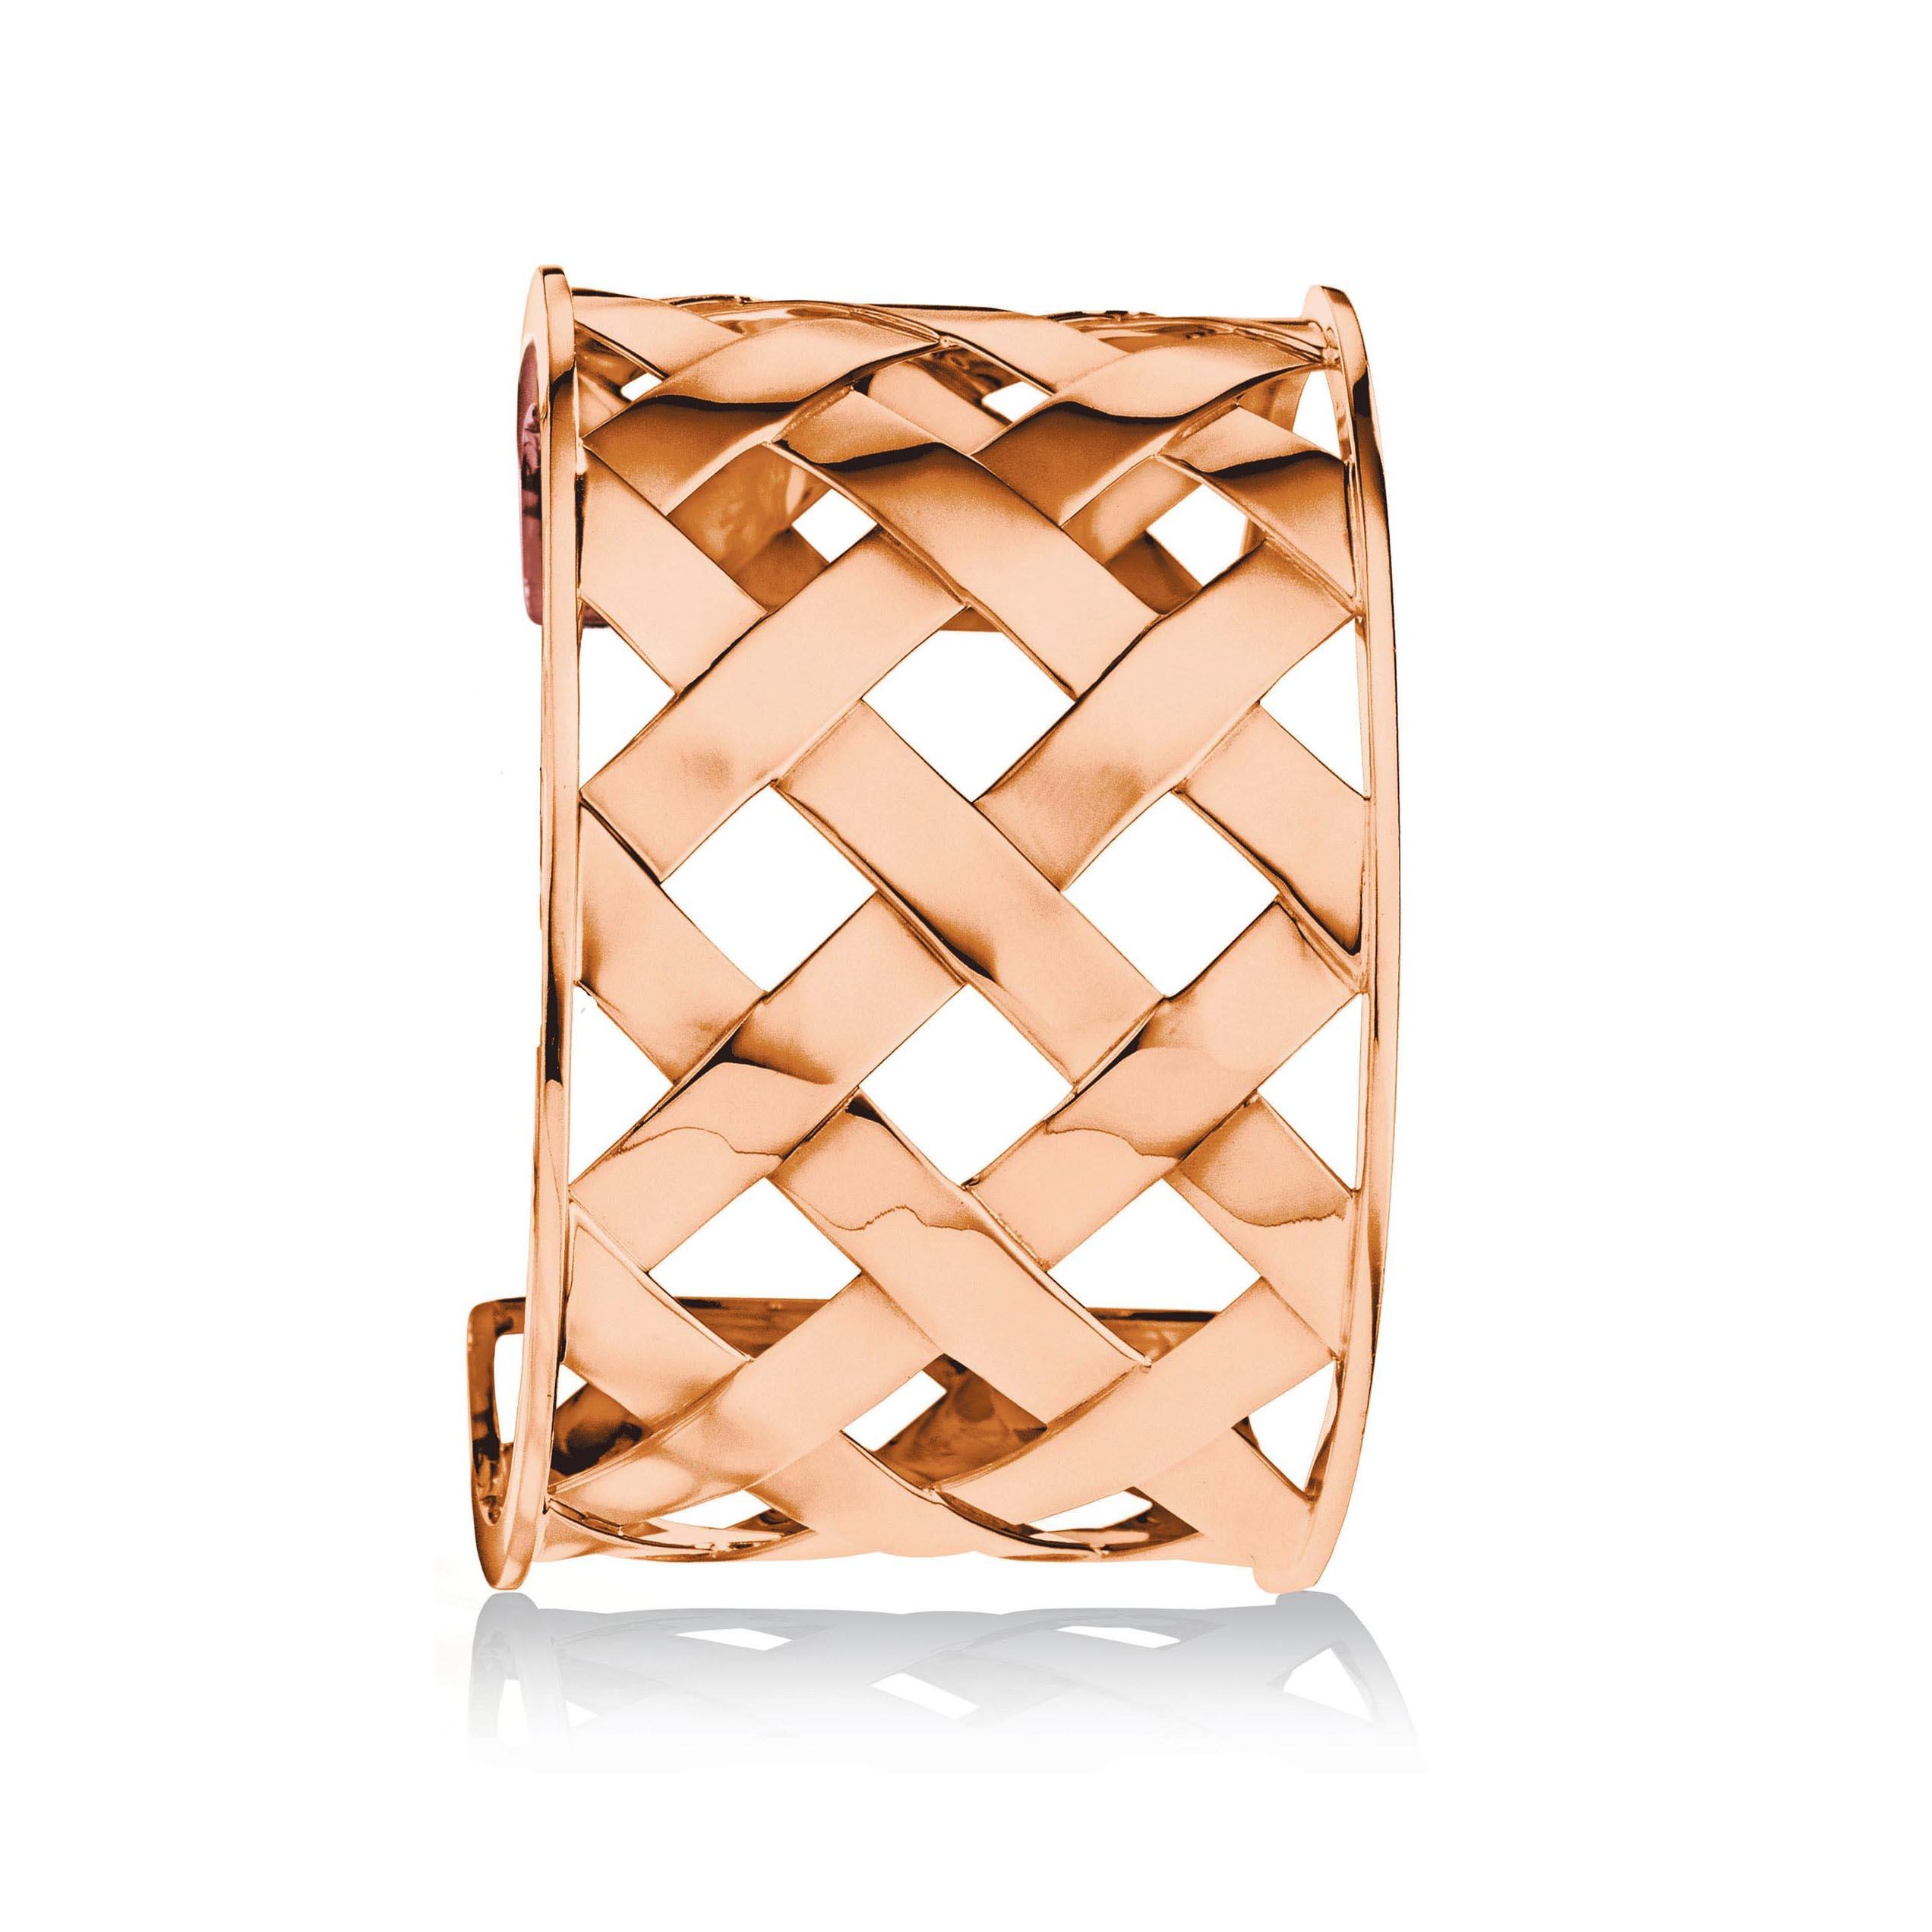 Verdura-Jewelry-Criss-Cross-Cuff-Rose-Gold